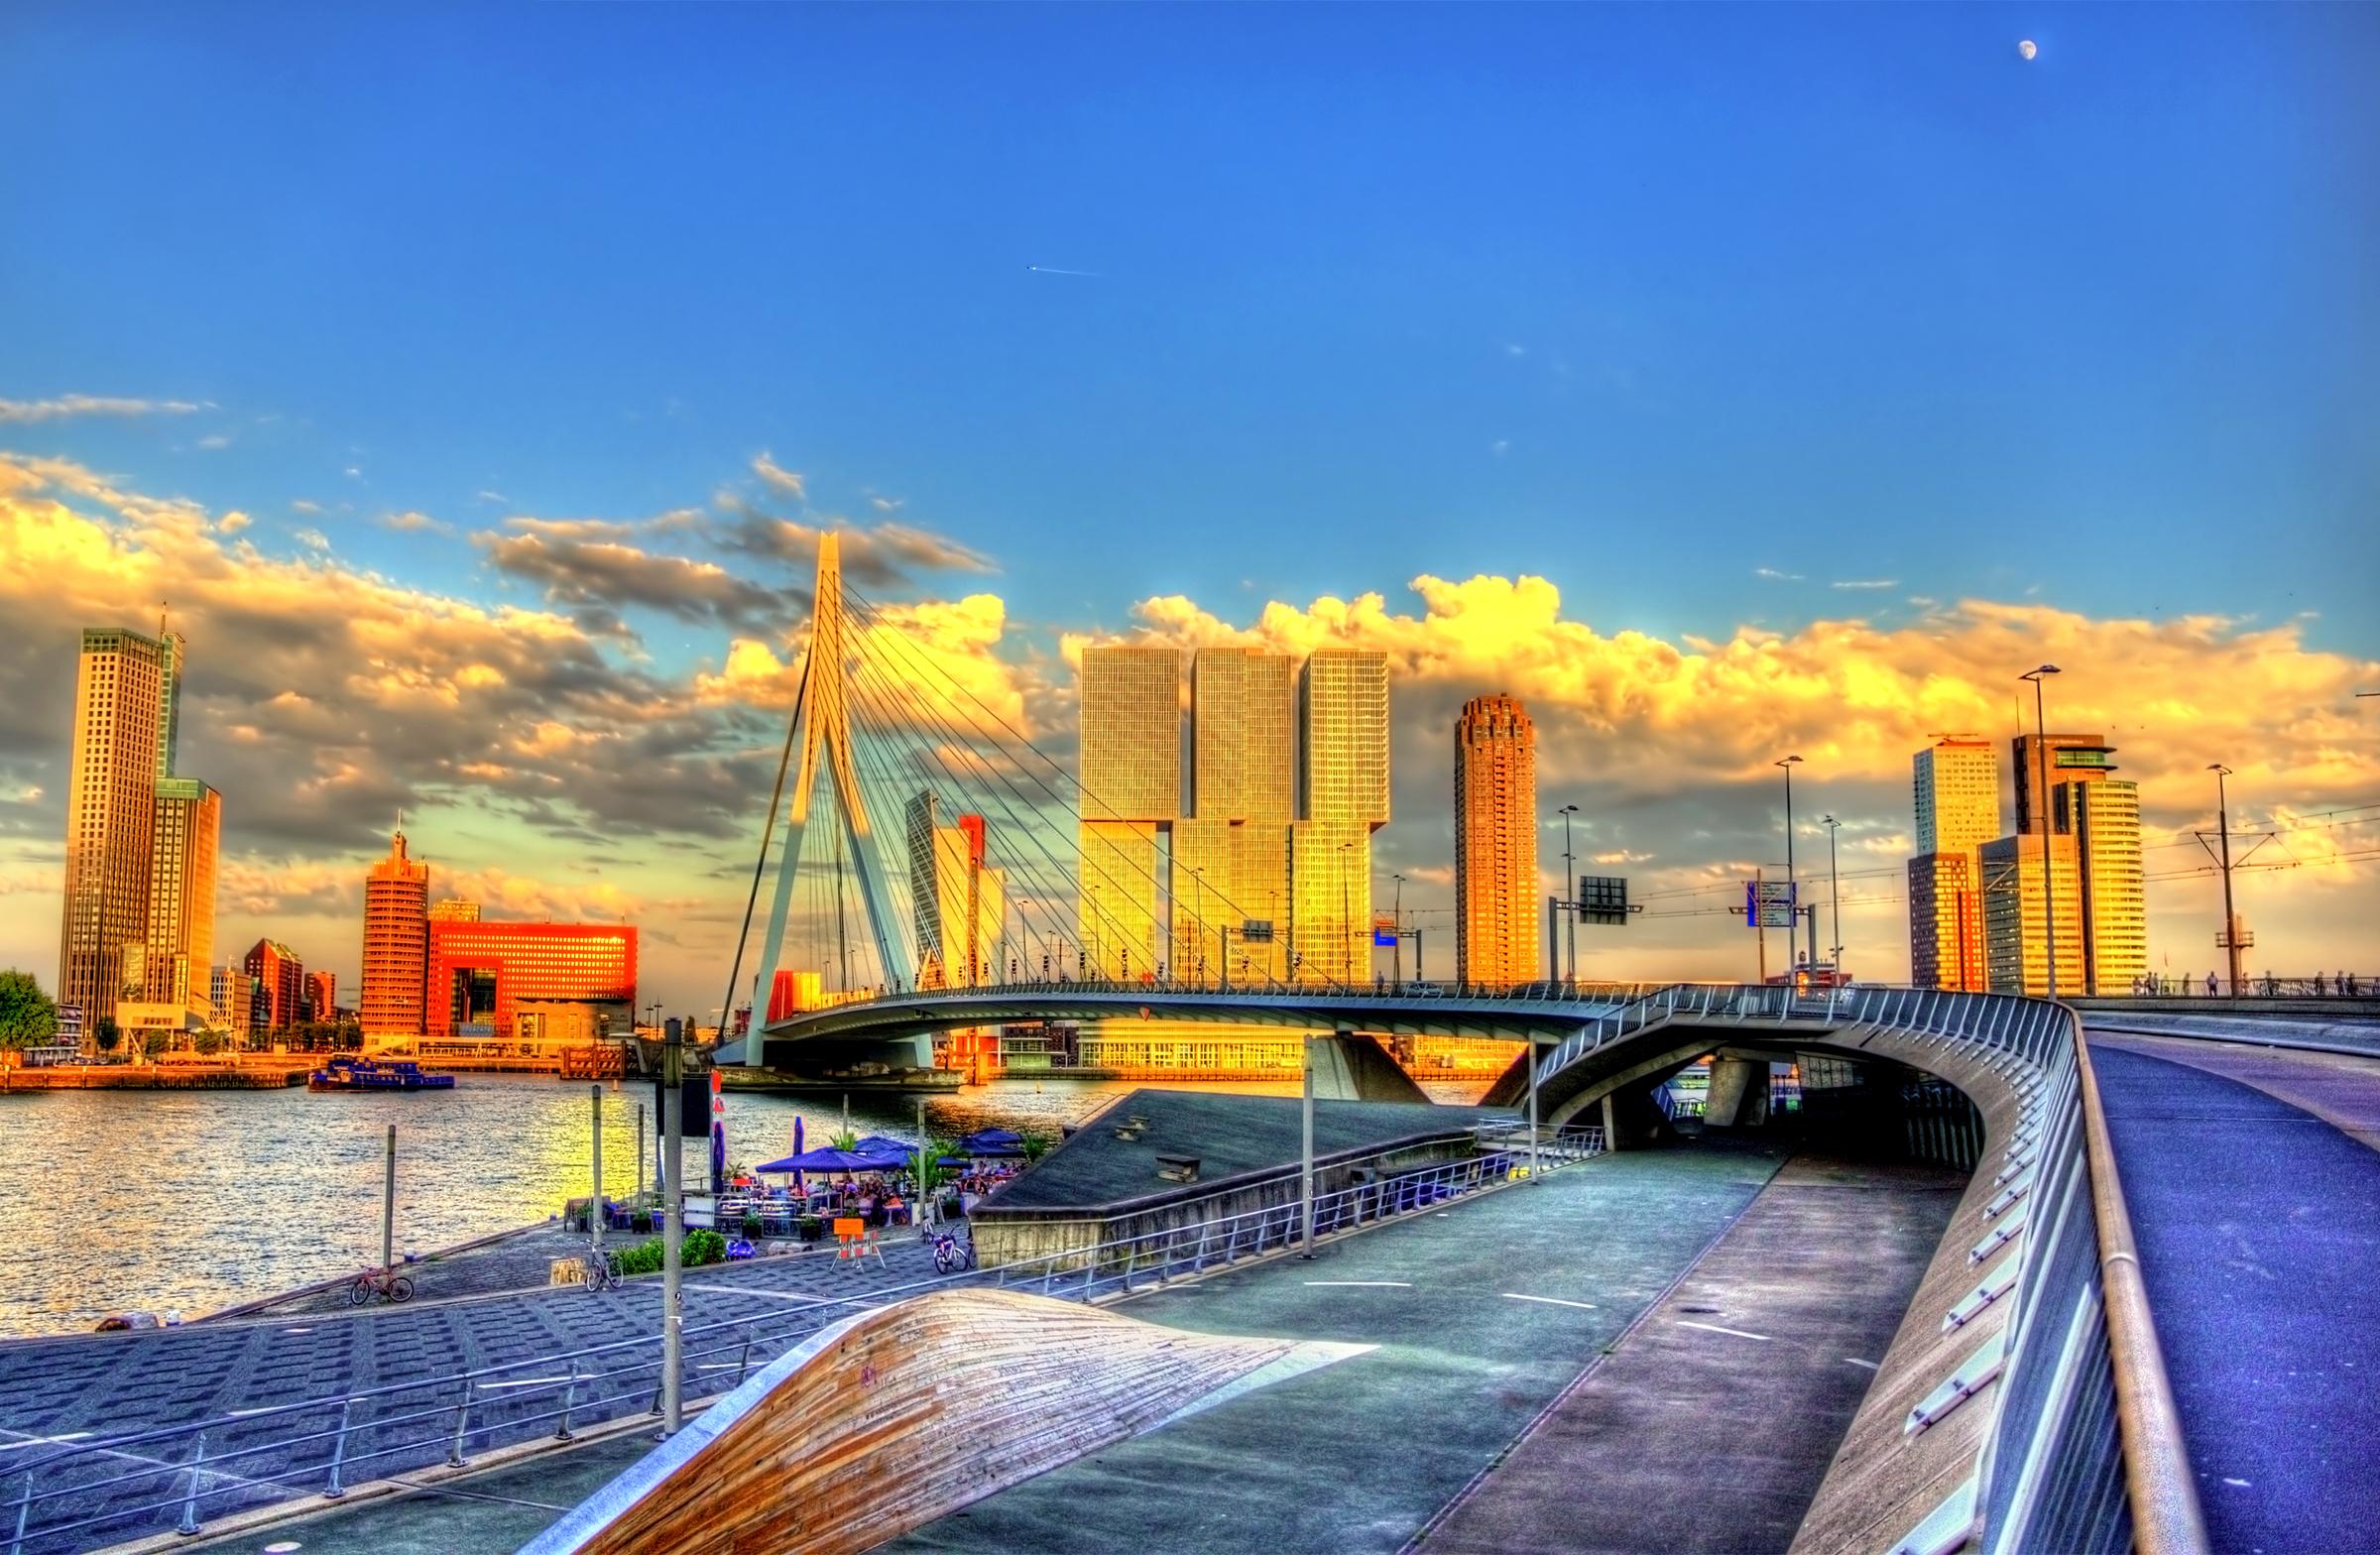 Erasmusbrug in Rotterdam, Netherlands